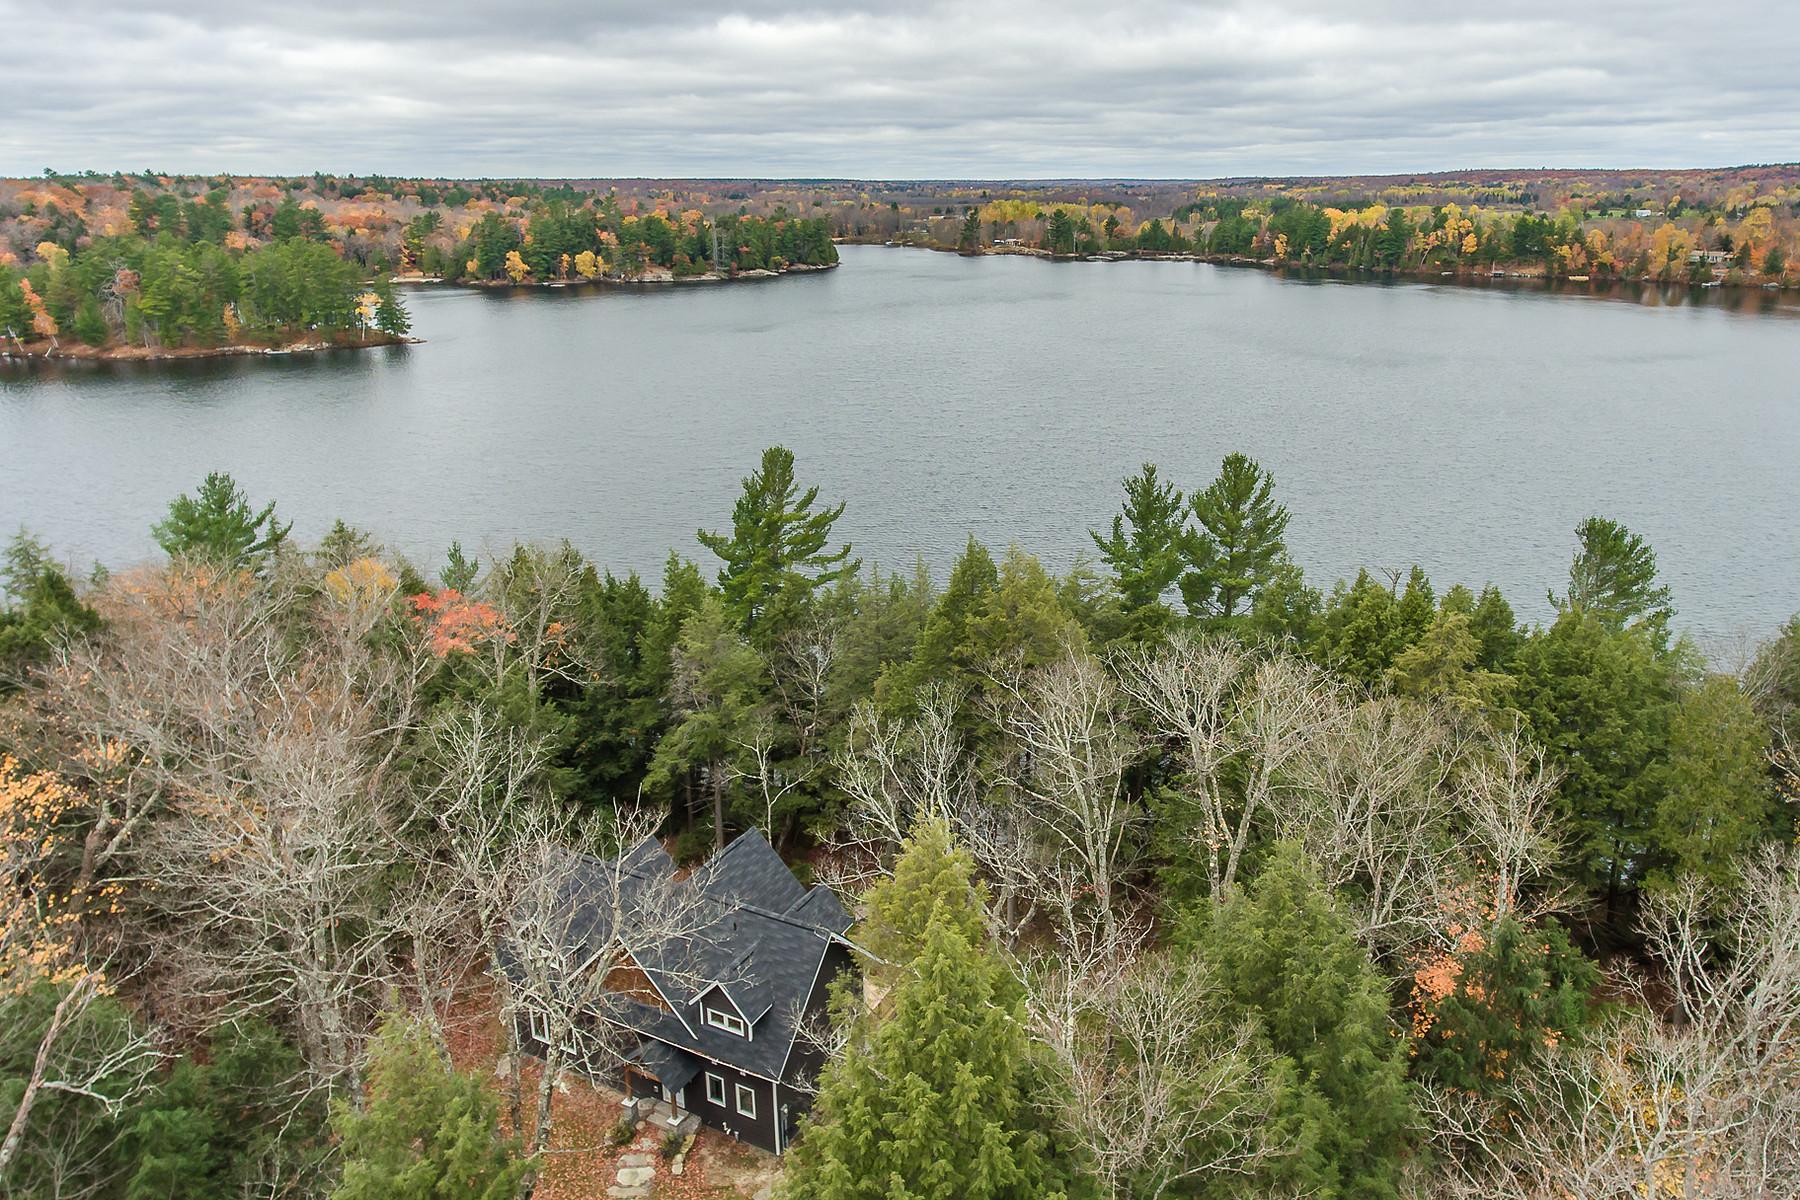 أراضي للـ Sale في Waterfront Lot-330' shoreline Lot 8 Lake Ridge Rd, Muskoka, Ontario, P2A 2W8 Canada